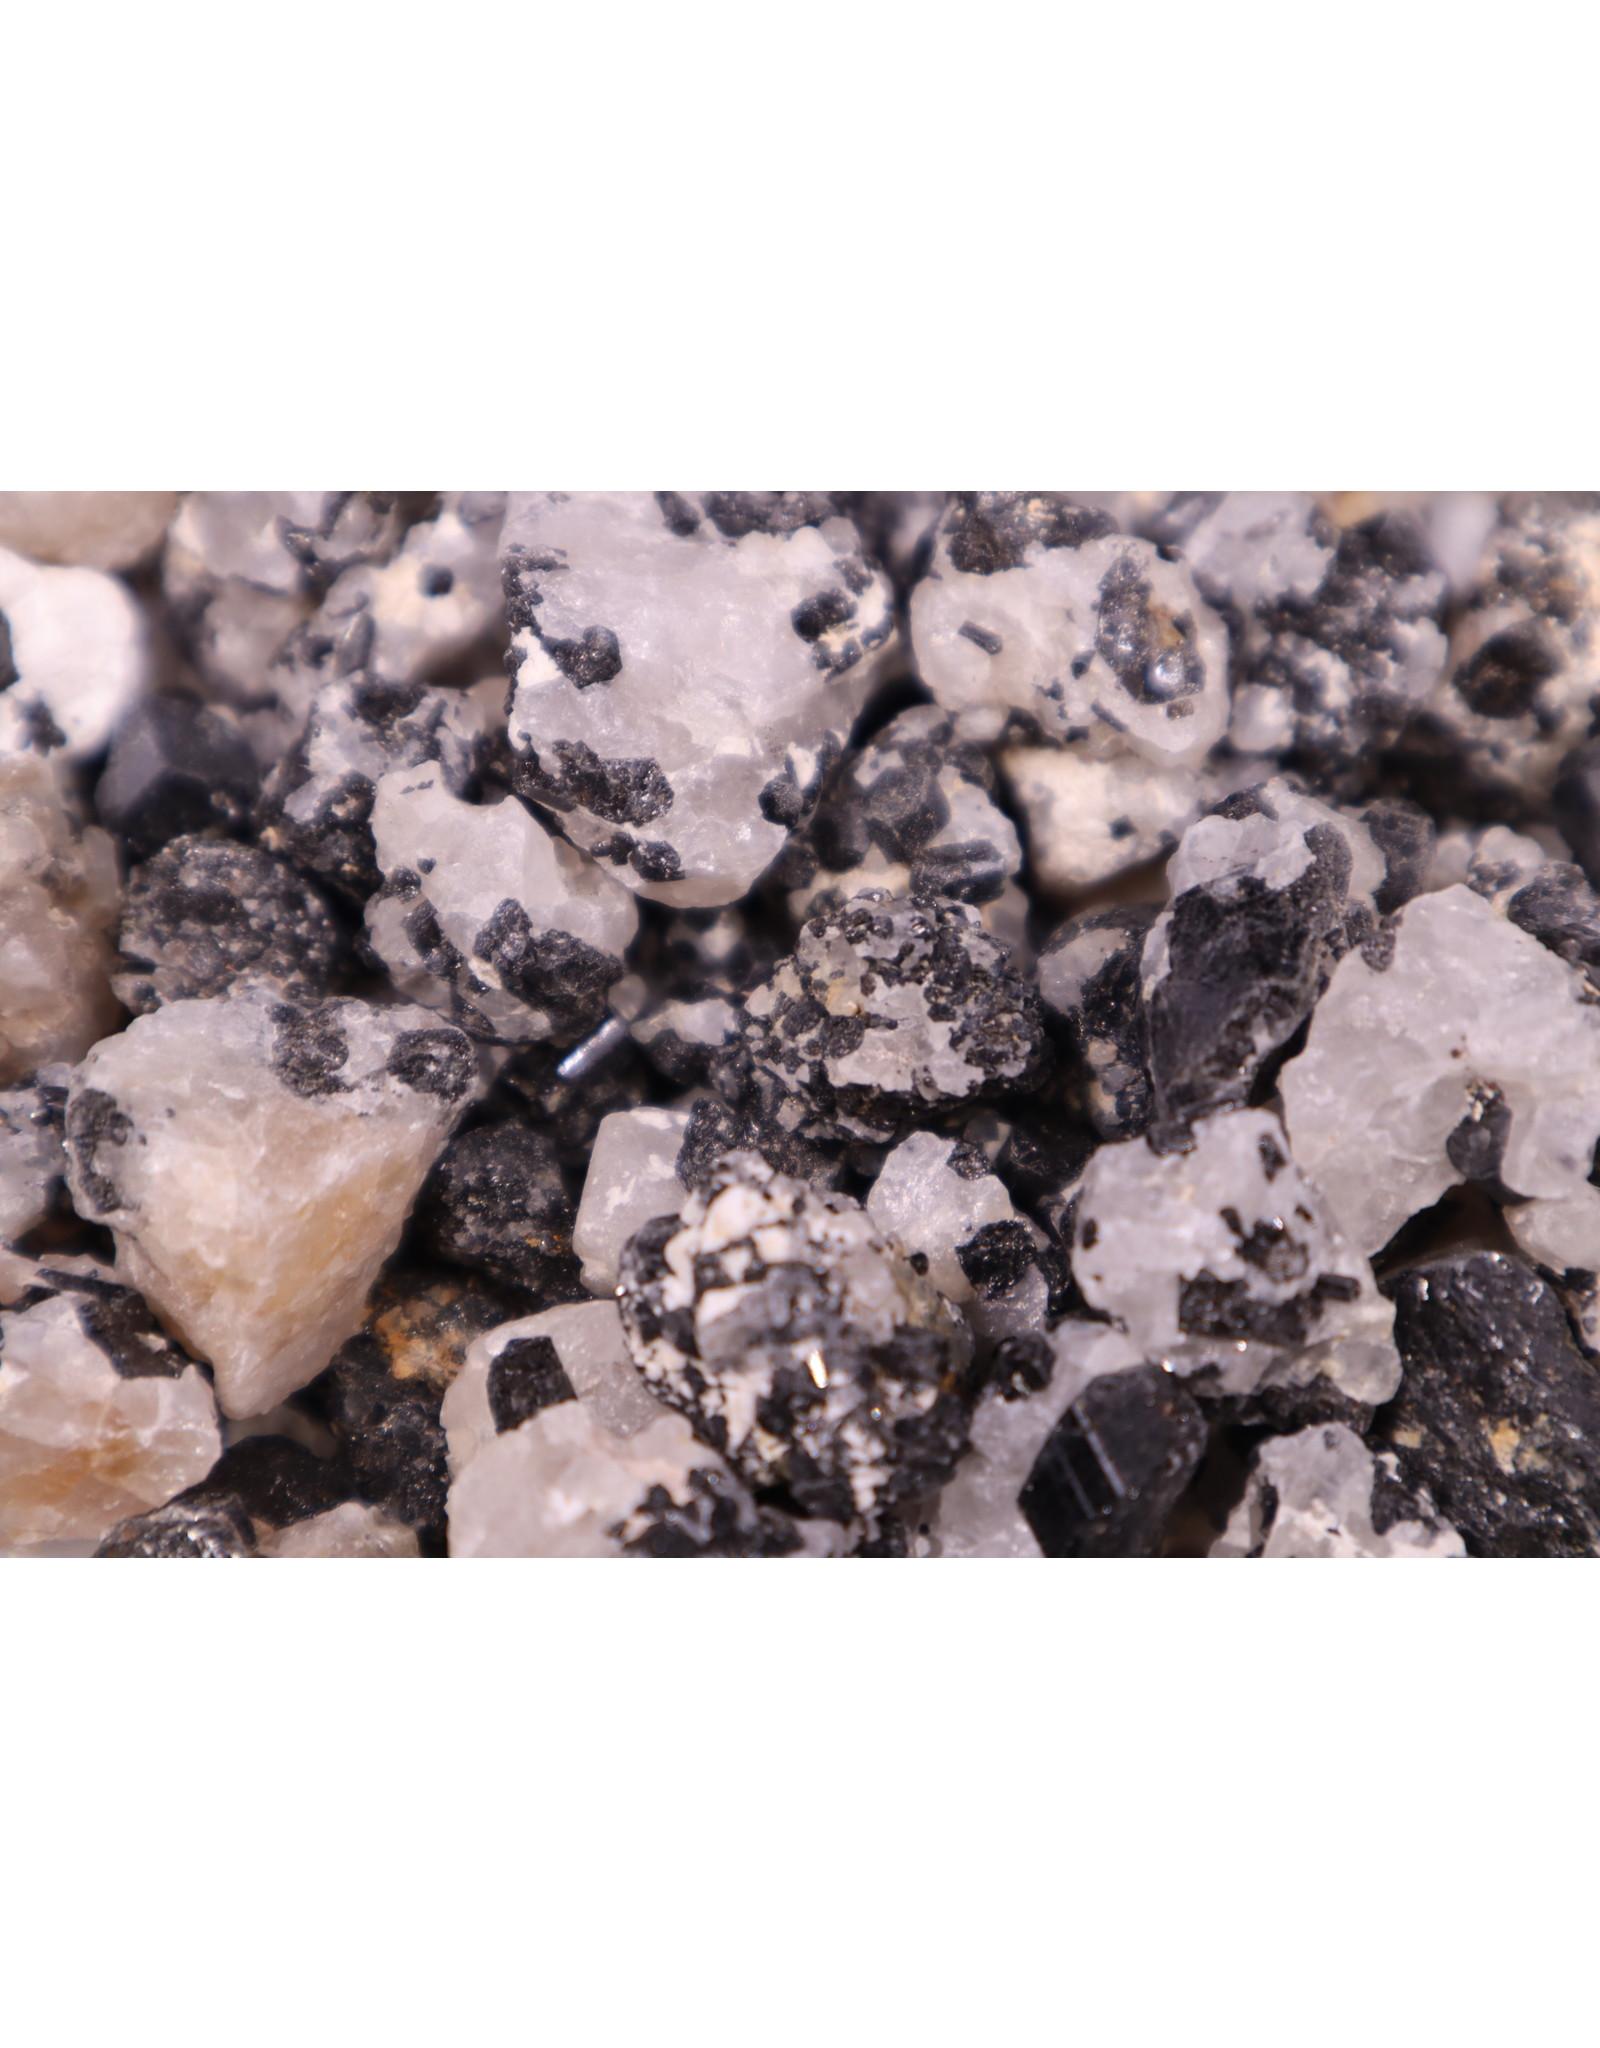 Black Tourmaline  on Quartz - Rough